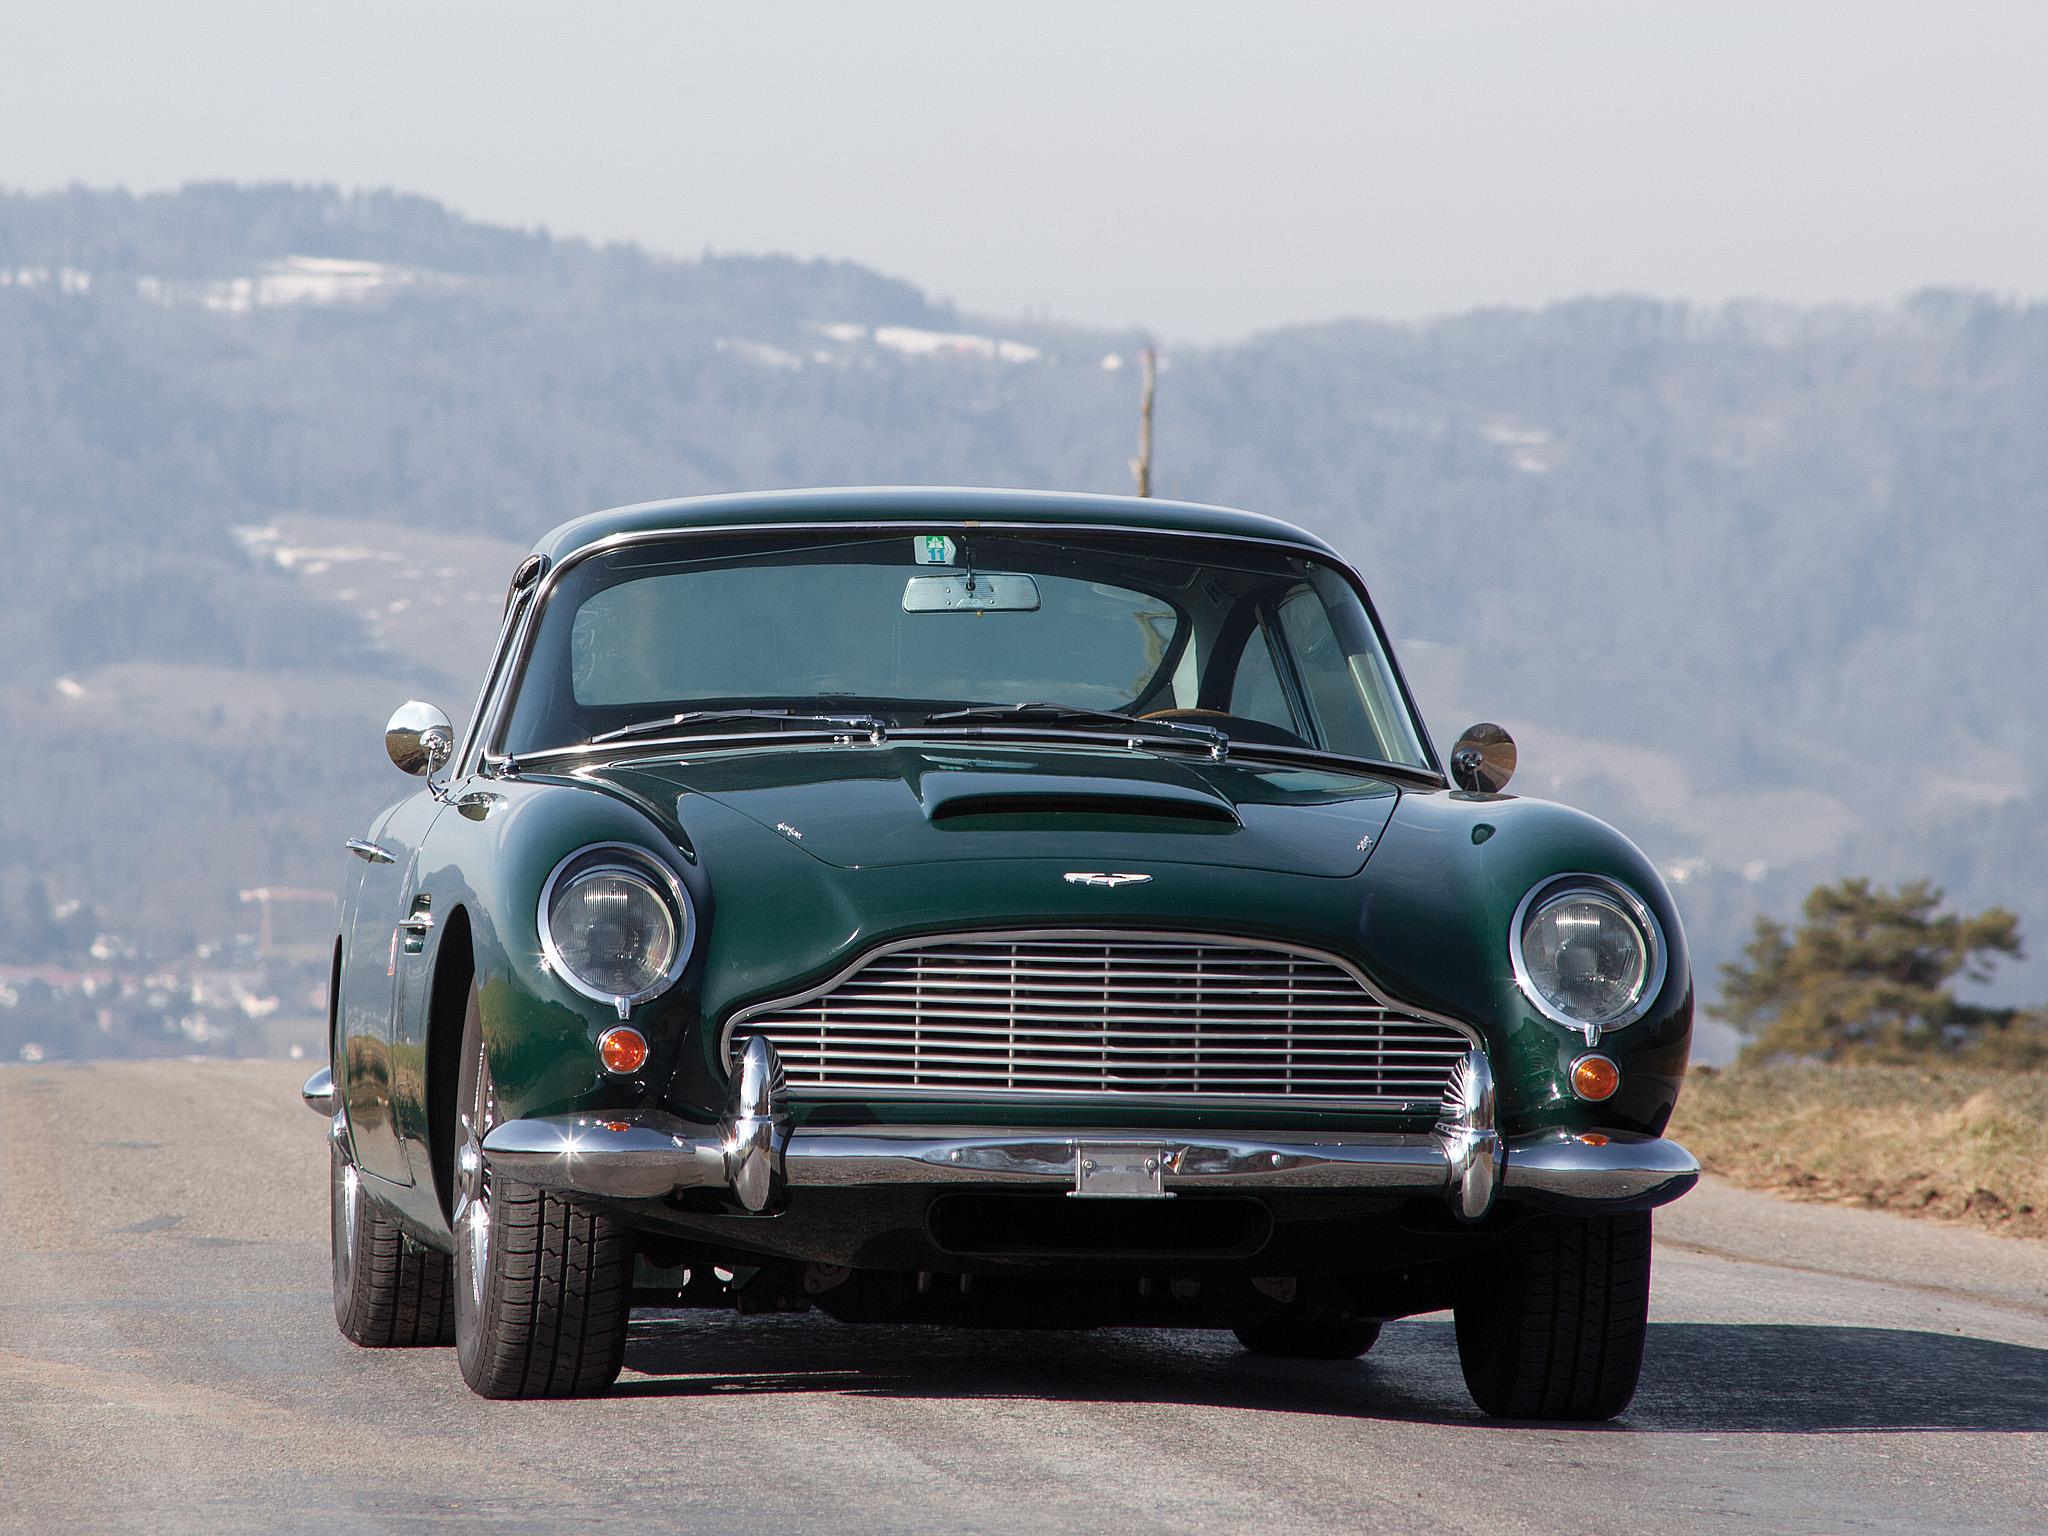 Aston Martin DB5 Wallpapers Car wallpapers HD 2048x1536